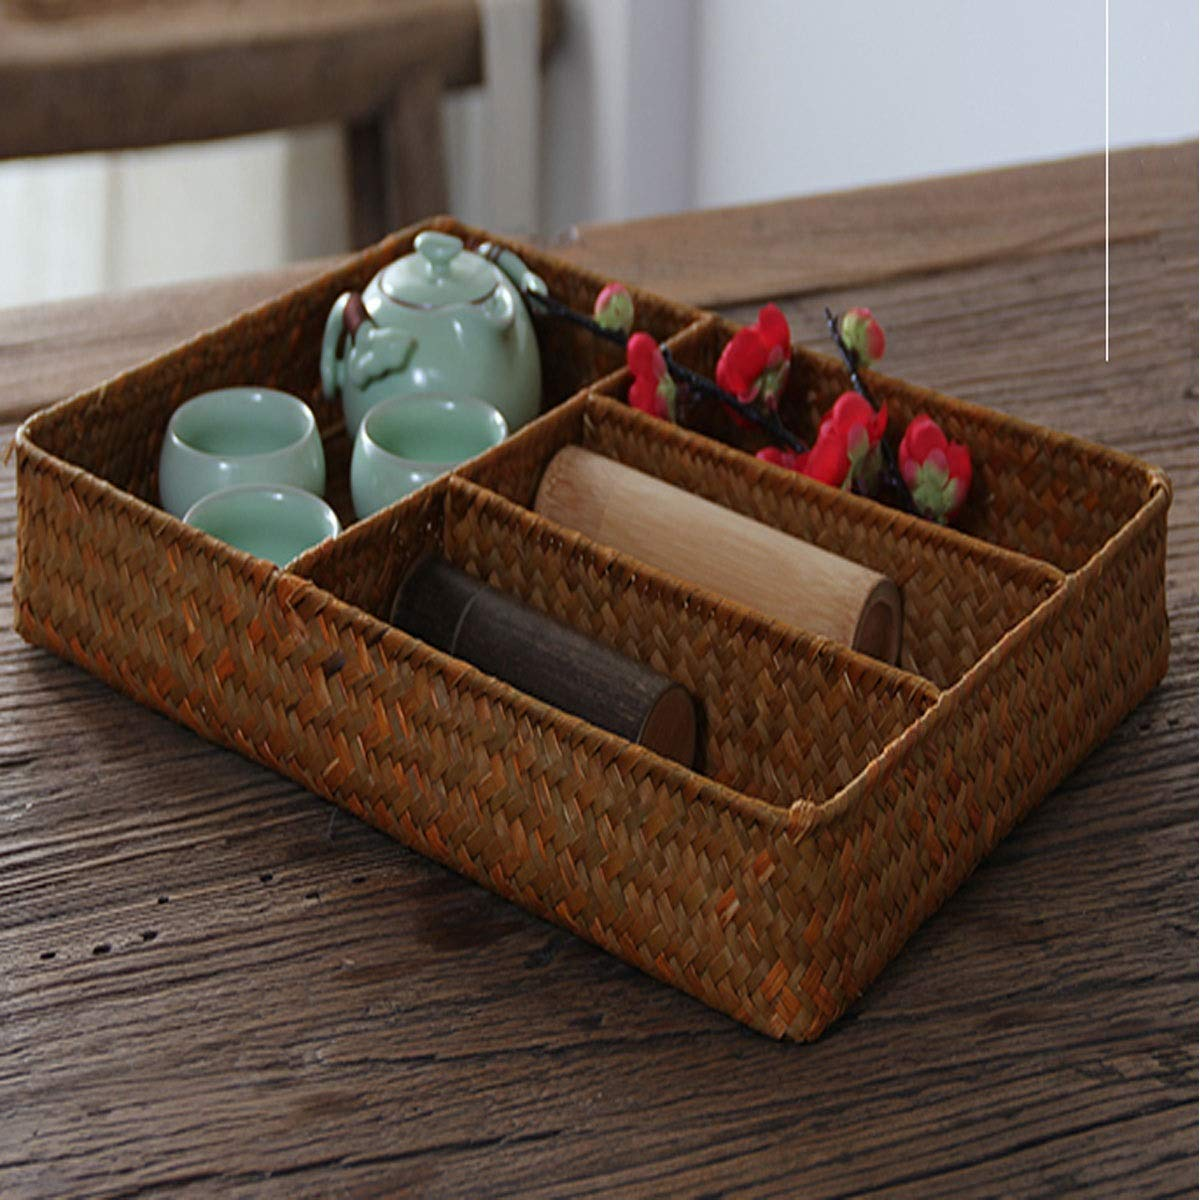 Bamboo Straw Storage Basket products2 Lattice Storage Box Storage Box Tea Room Tea Ceremony Guyuexuan Hand-woven Storage Box Shape : 2